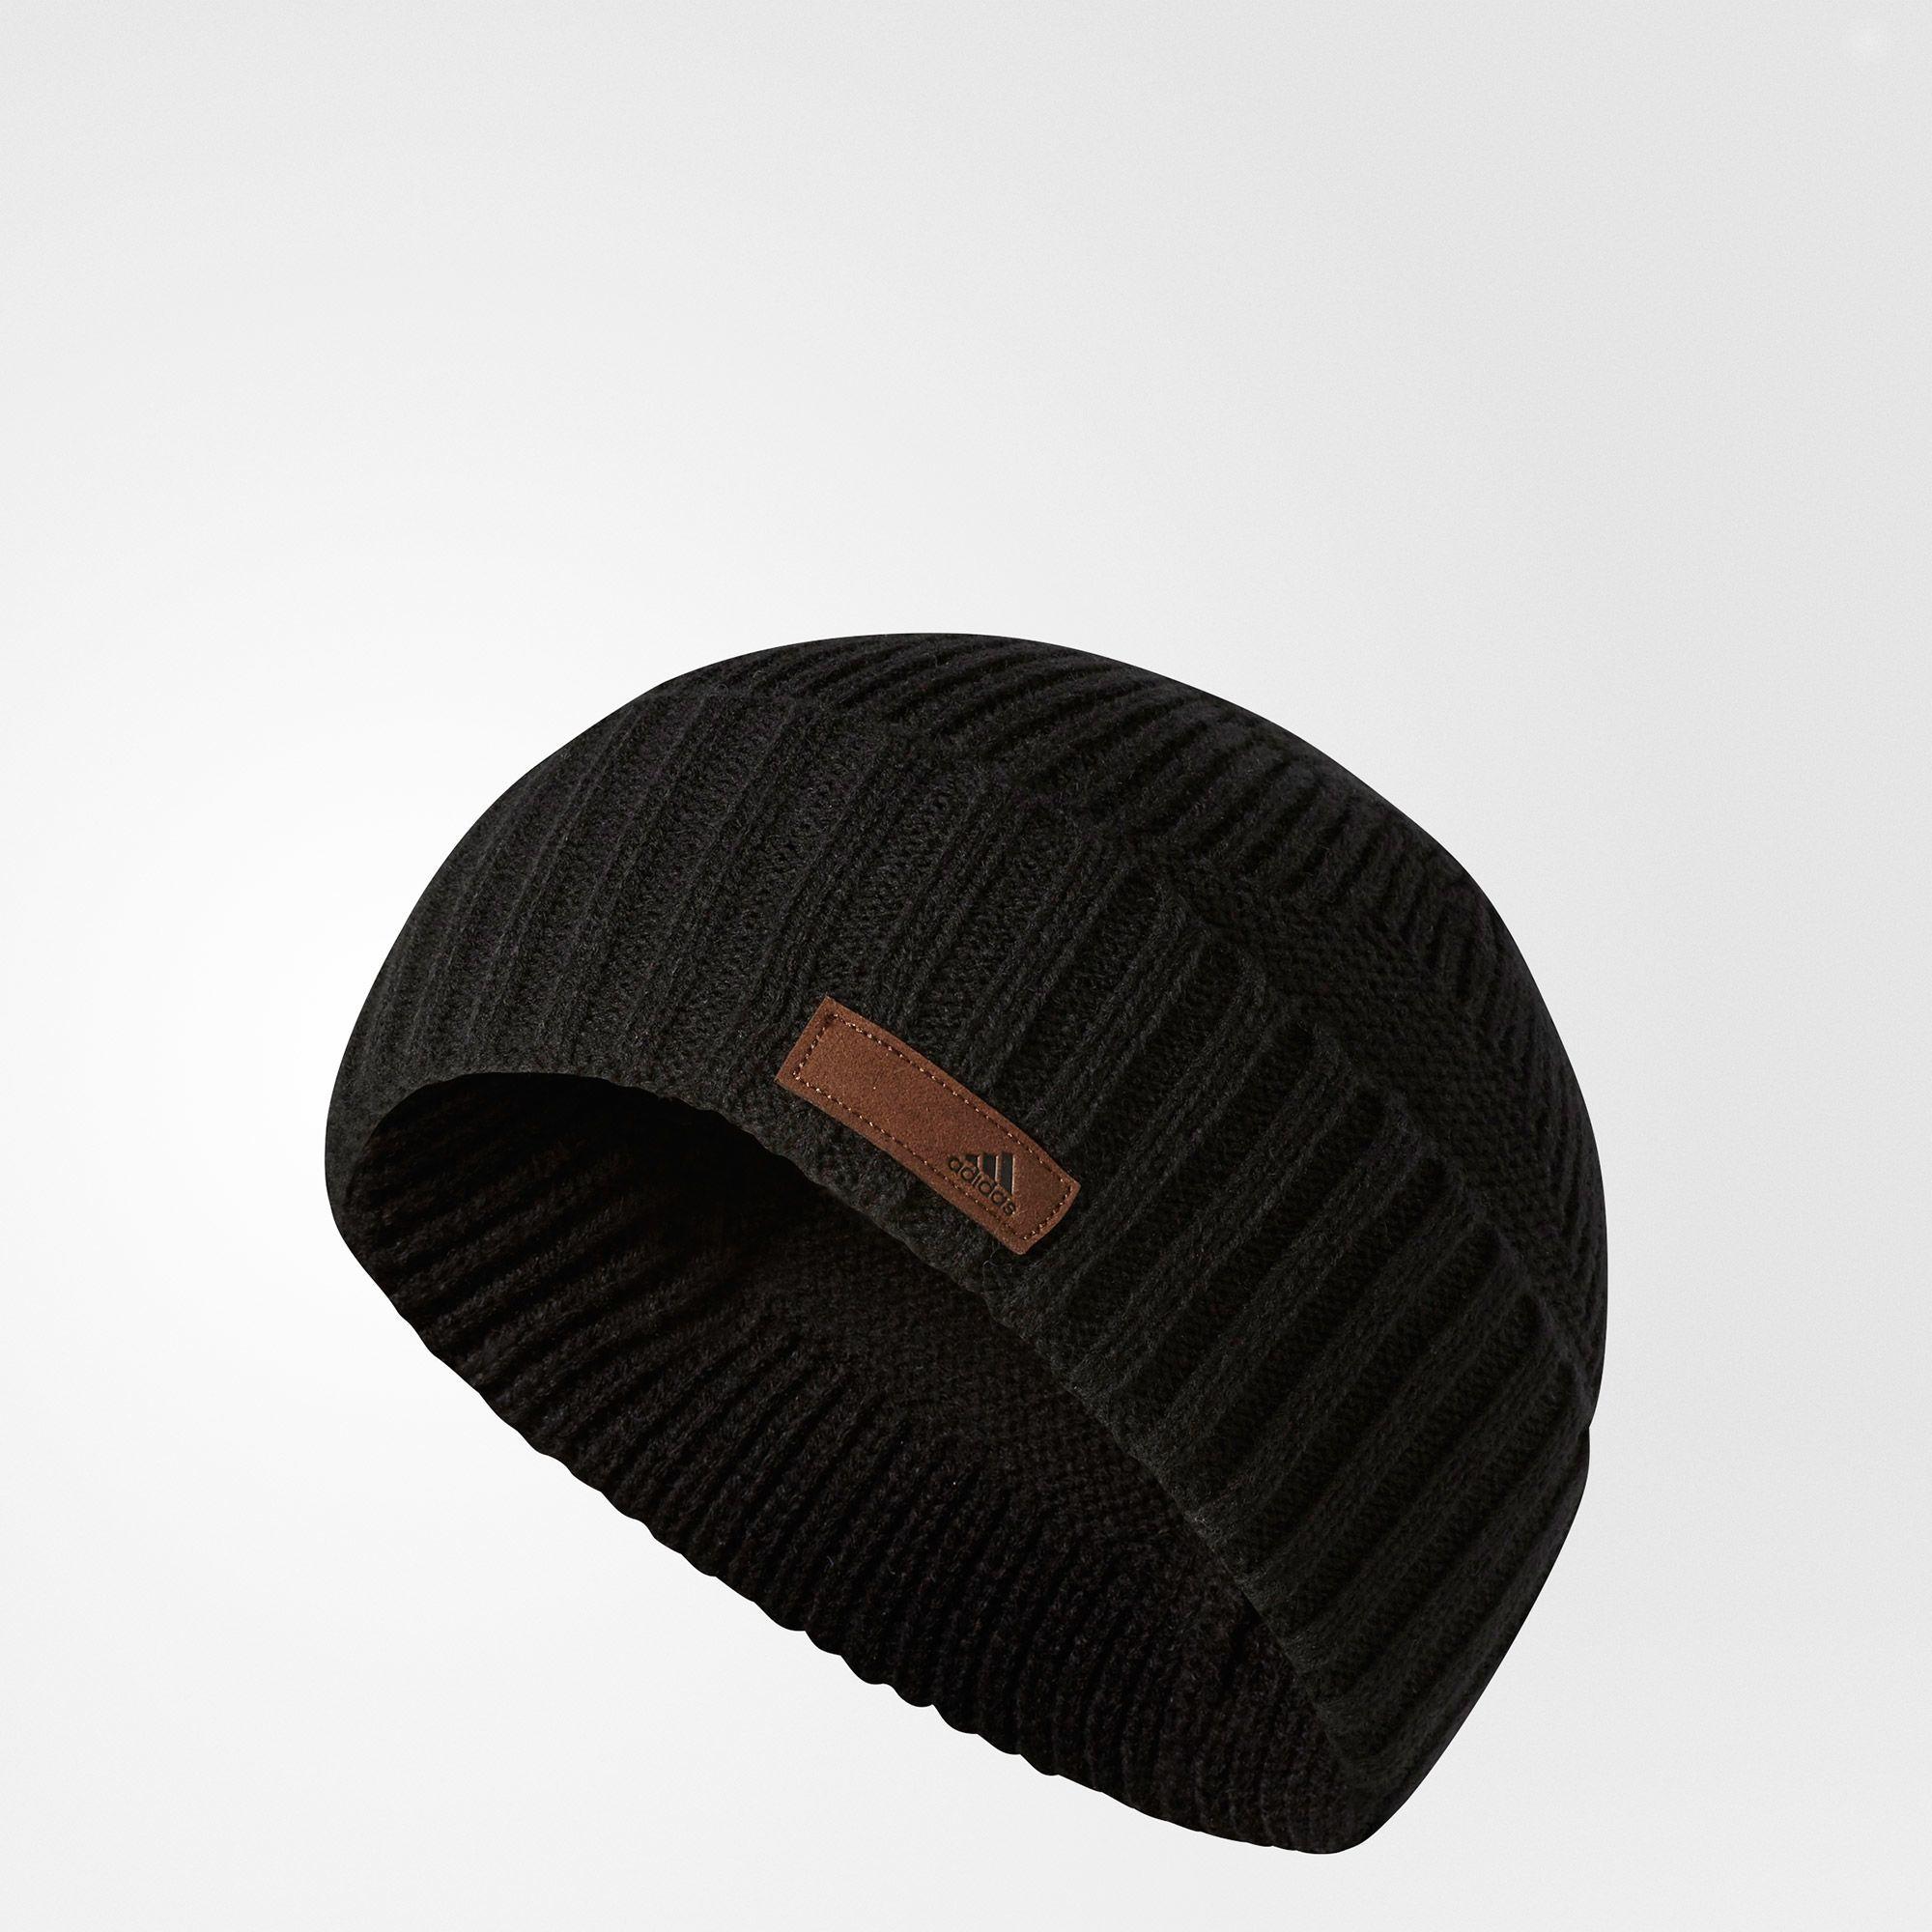 ddd31e626000c Pine Tree · adidas - Pine Knot Beanie BA5492 Black Adidas